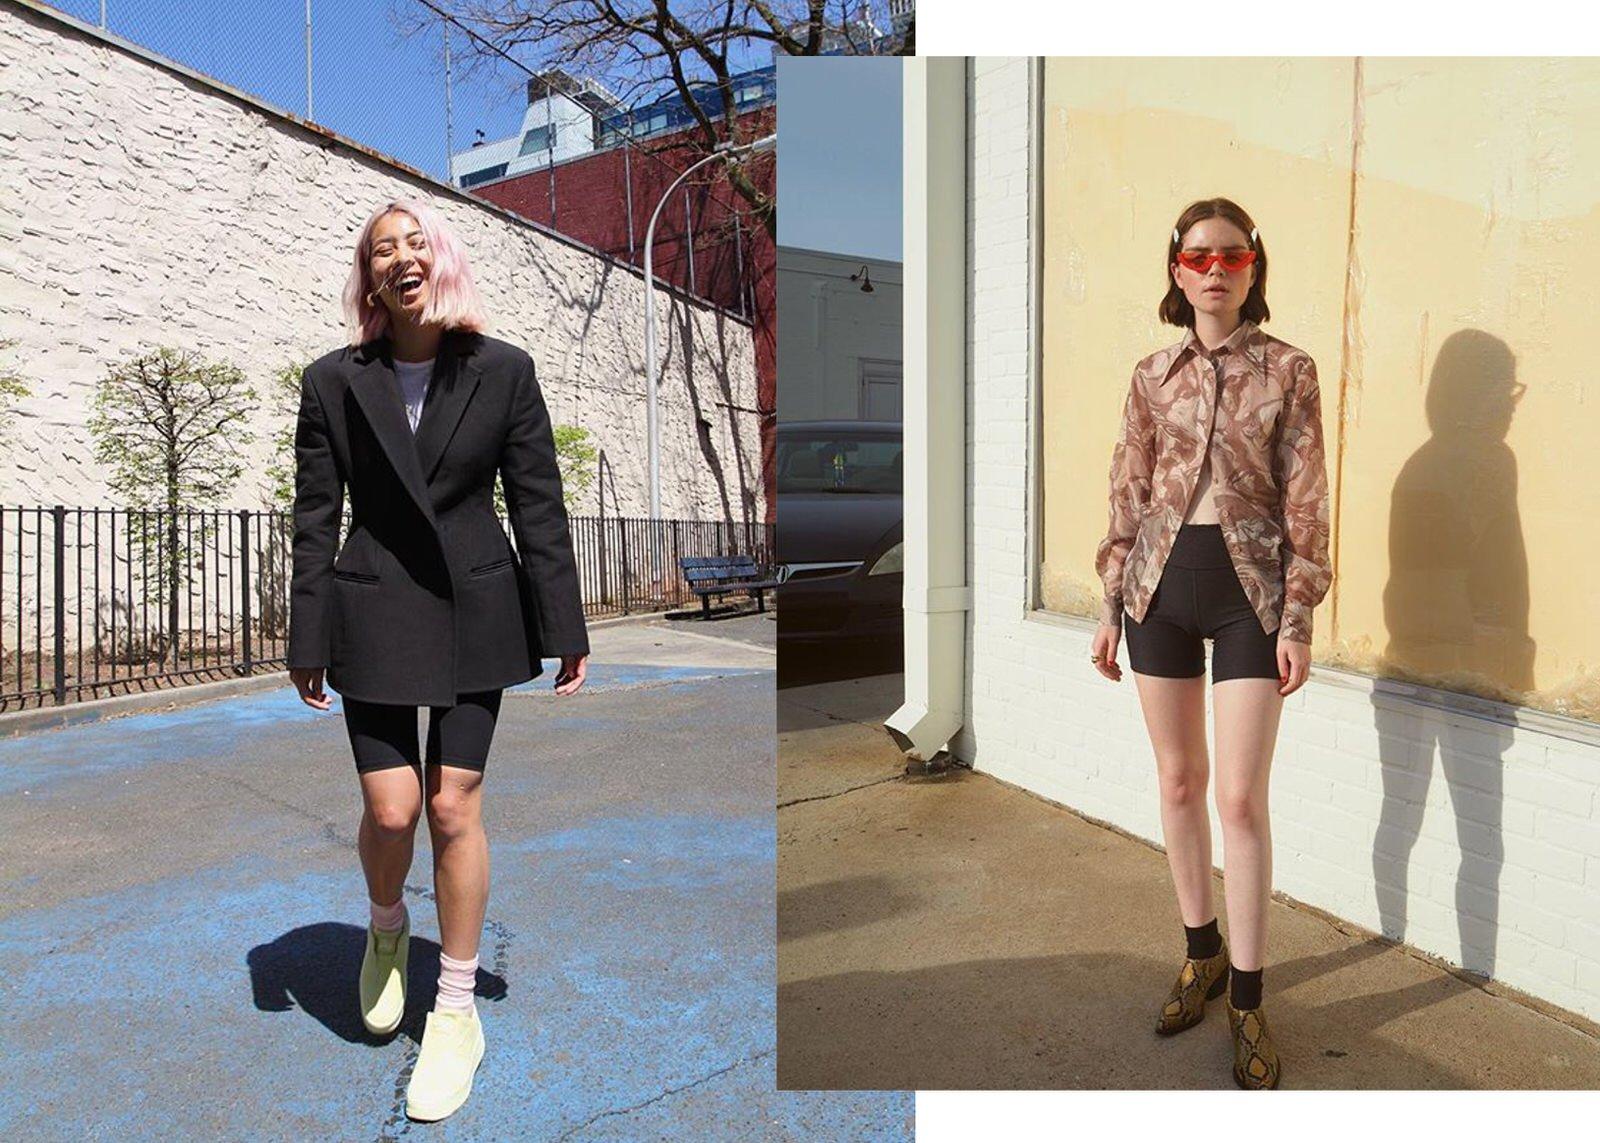 Bike shorts fashion trend in 2019